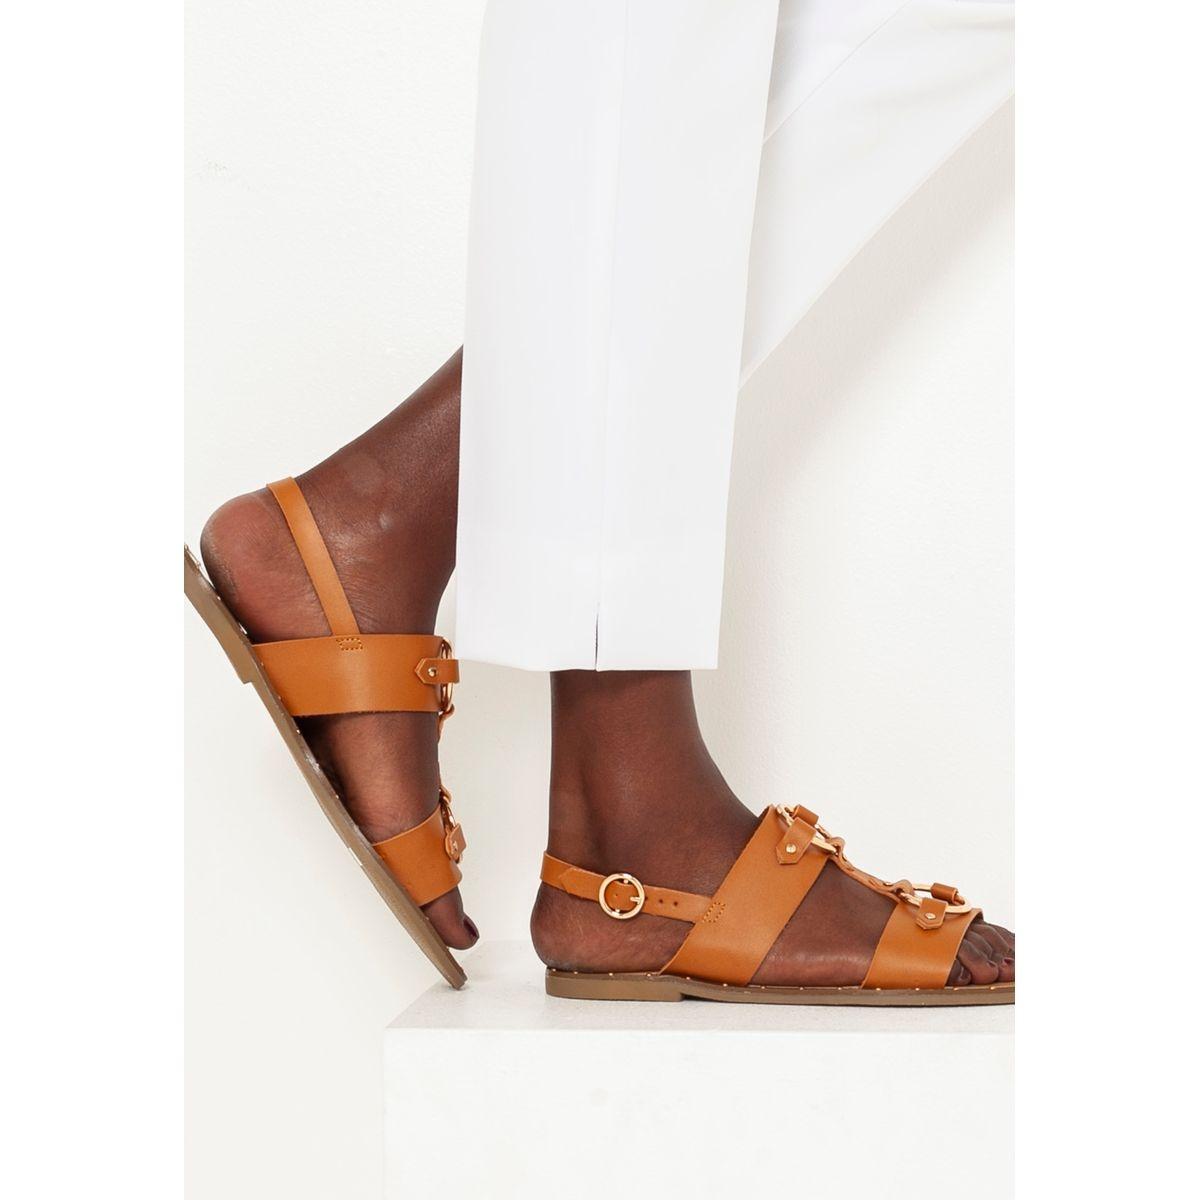 Sandales naturelles